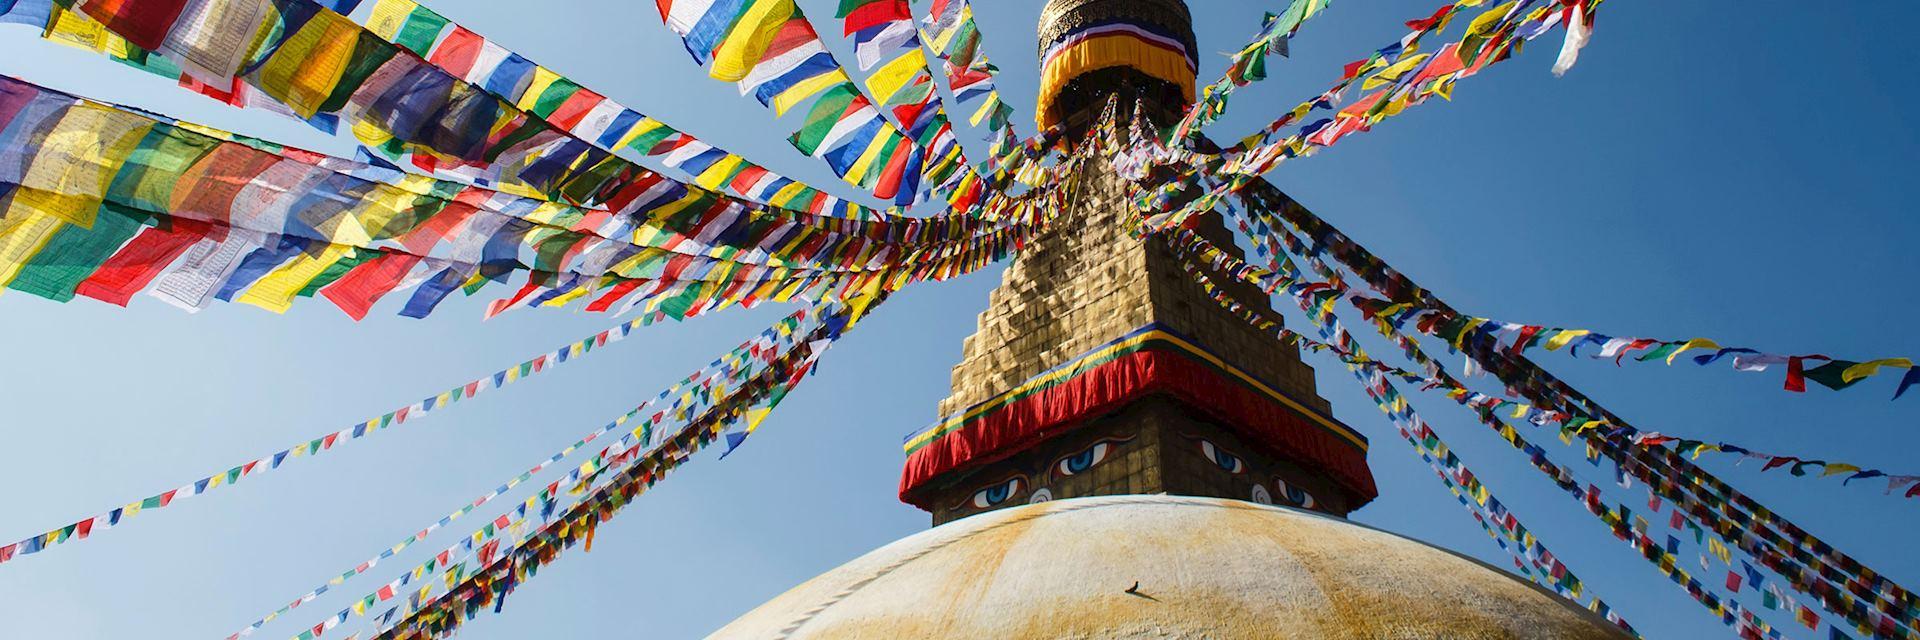 Prayer flags flying from a stupa in Kathmandu